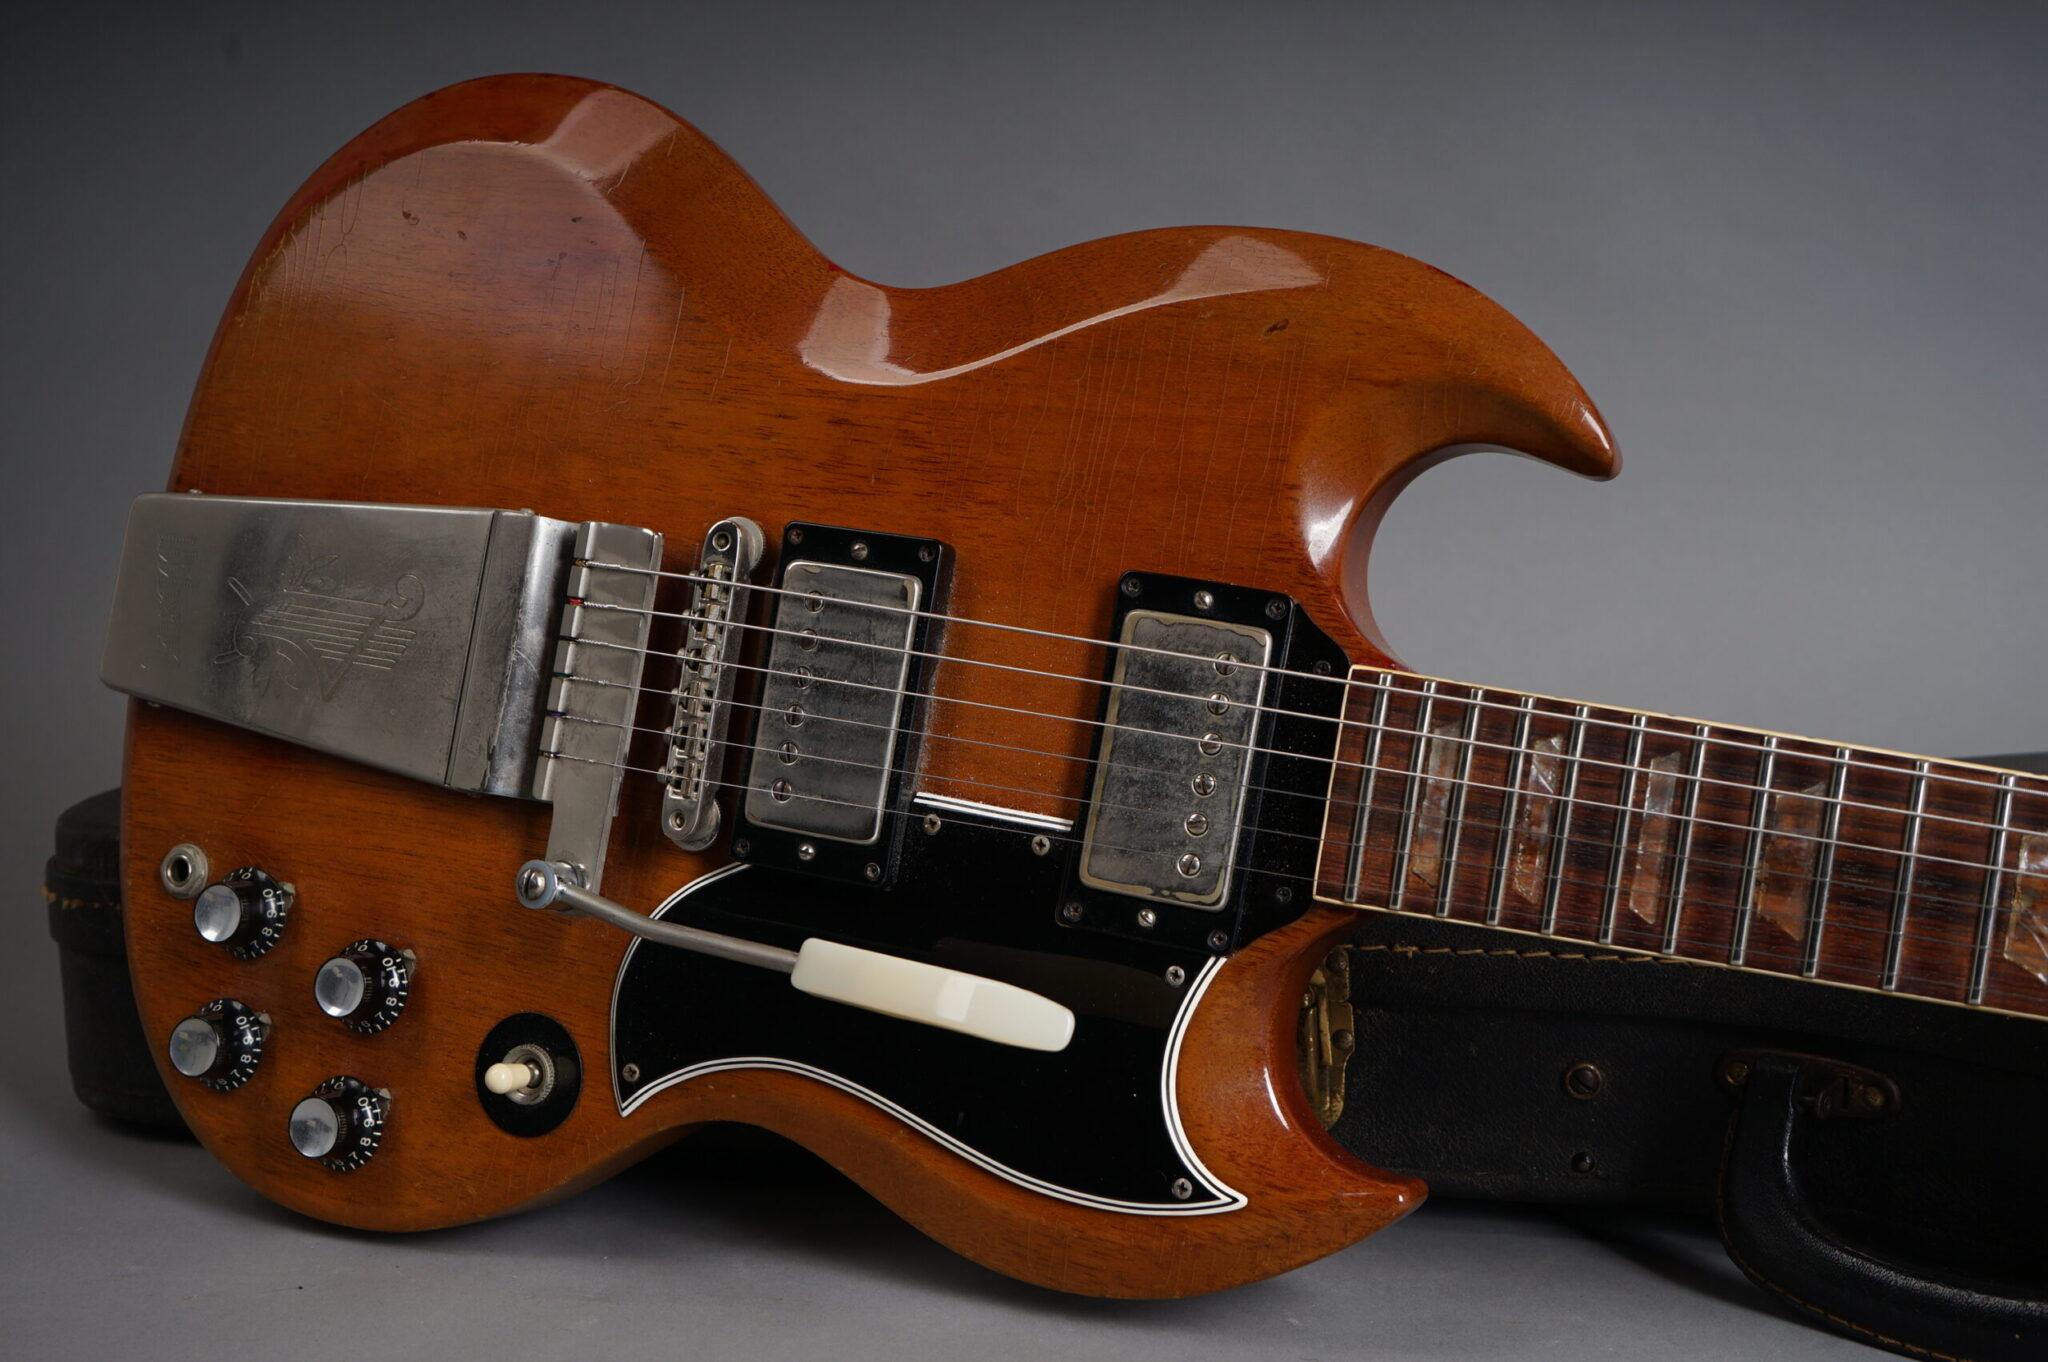 https://guitarpoint.de/app/uploads/products/1965-gibson-sg-standard-cherry-all-1964-specs/1965-Gibson-SG-Standard-275561-9-scaled-2048x1362.jpg